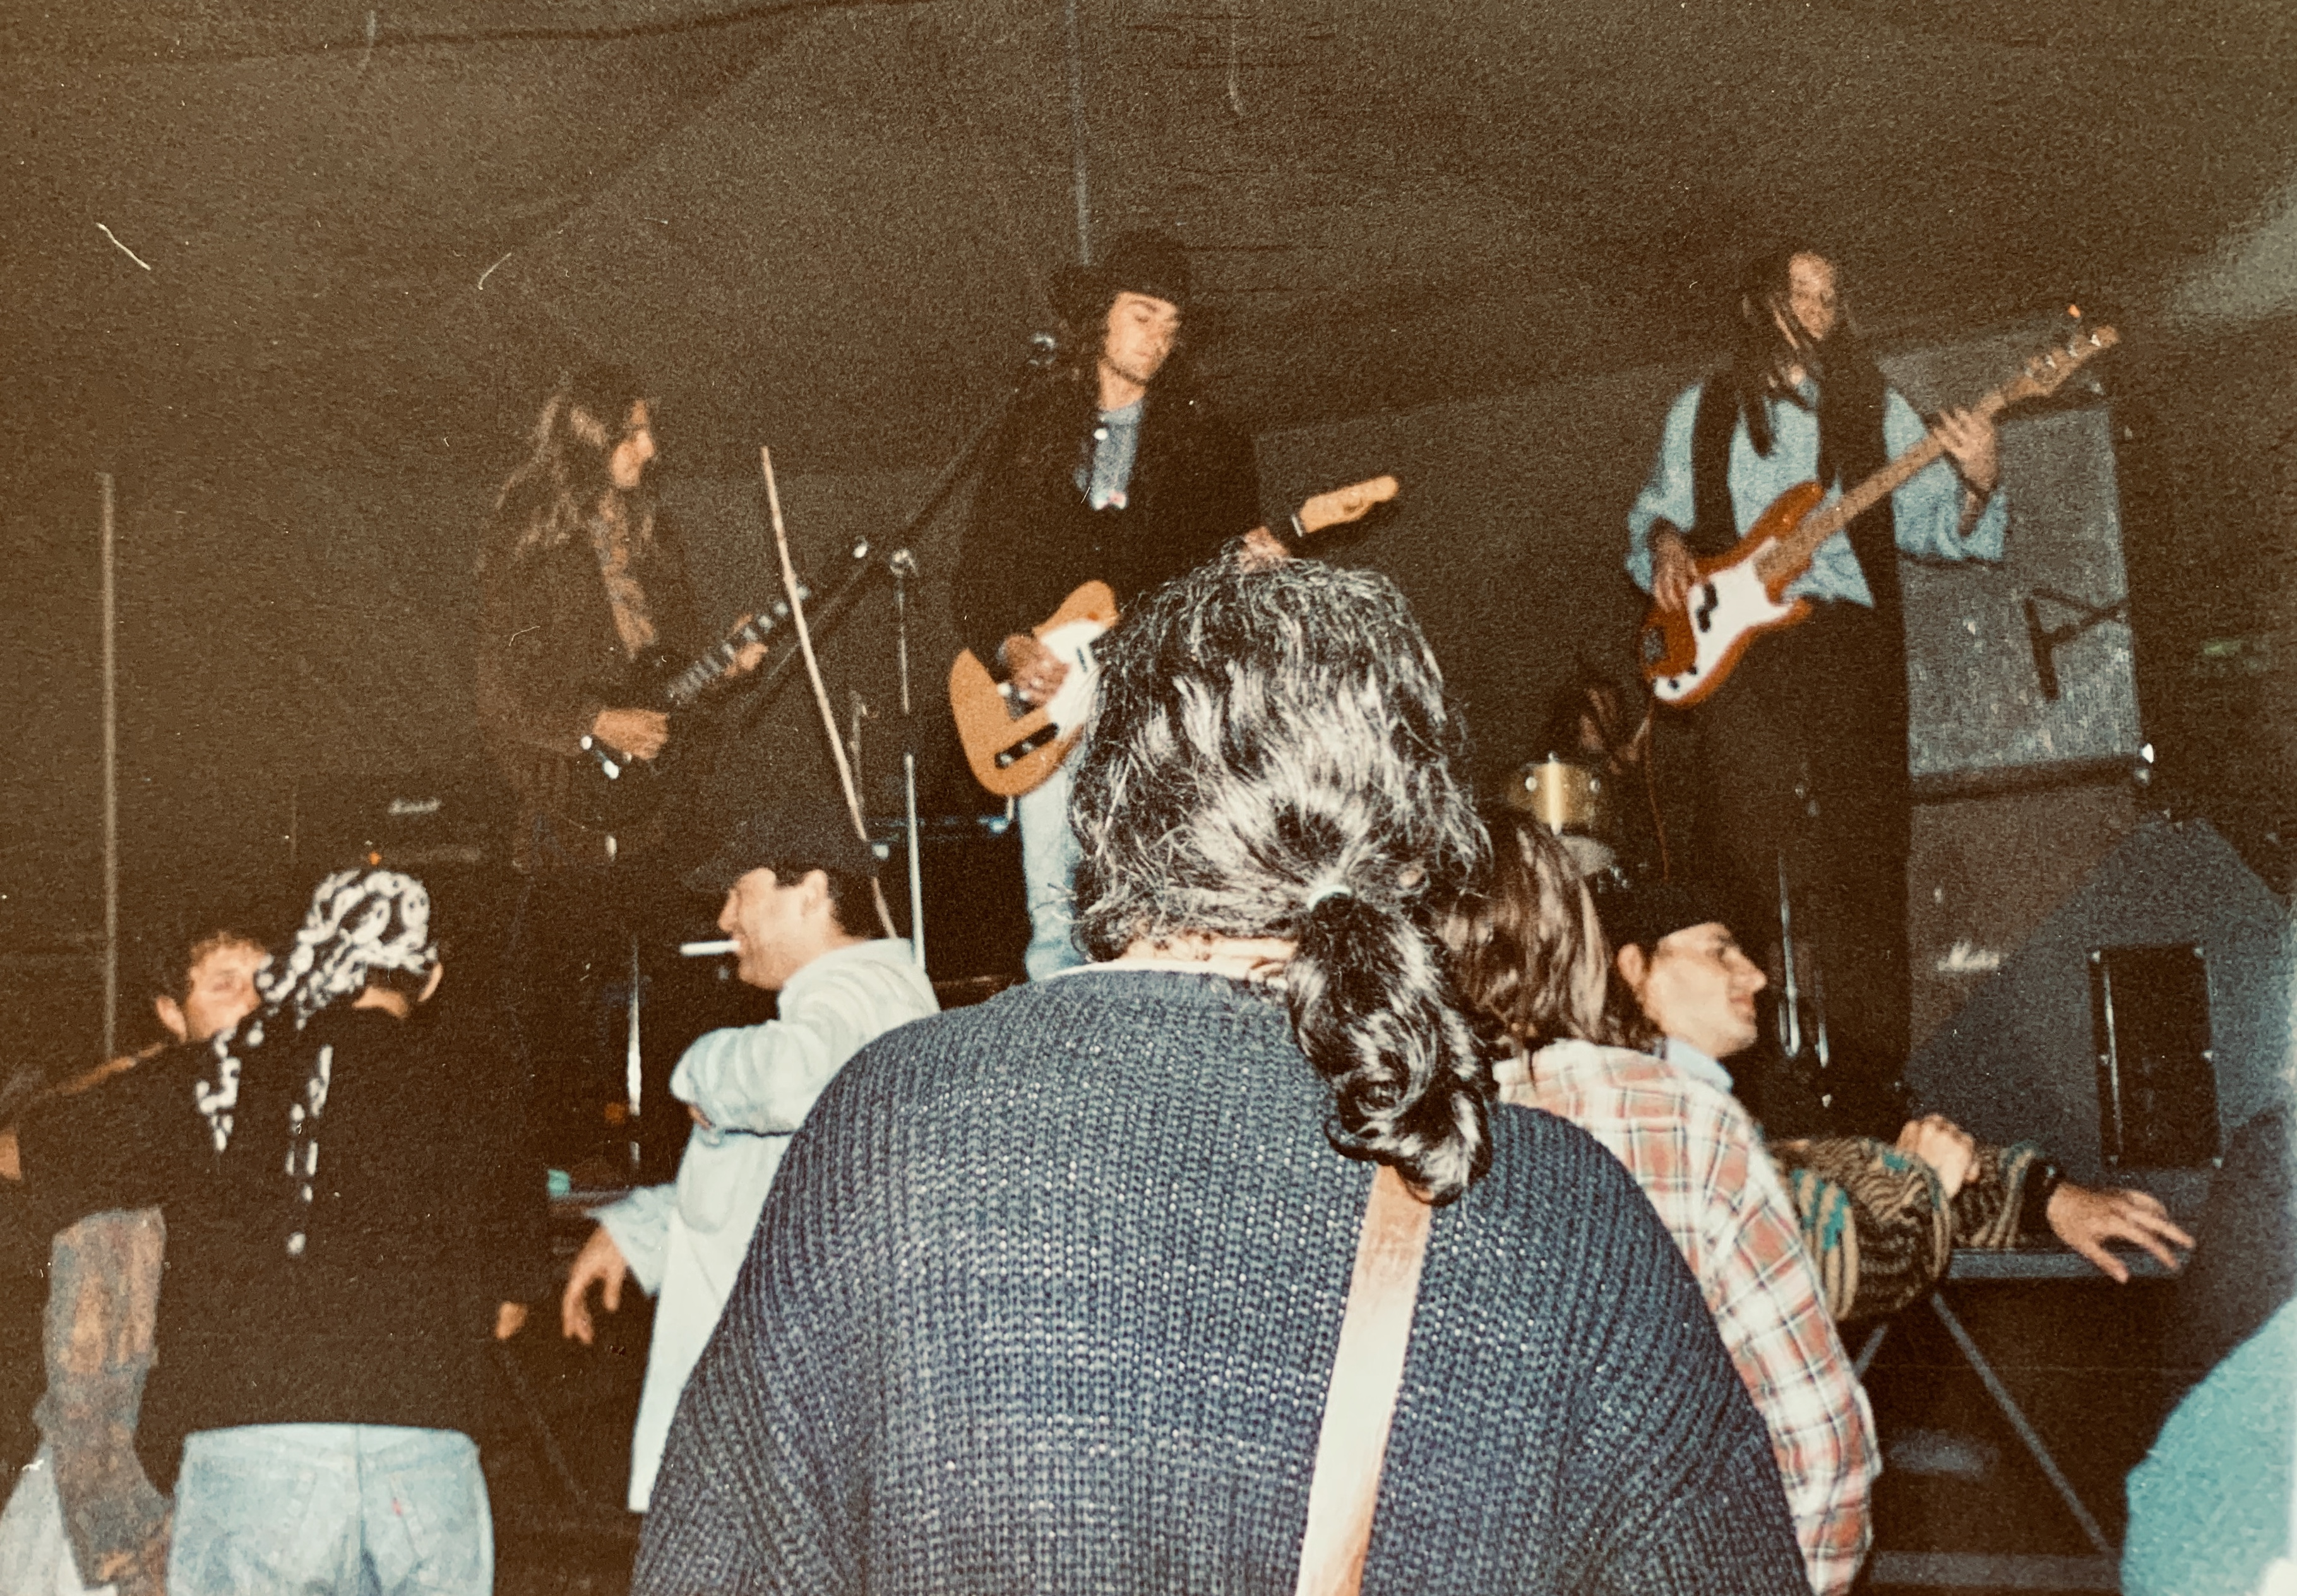 the_ragdoll_live_1995.JPEG